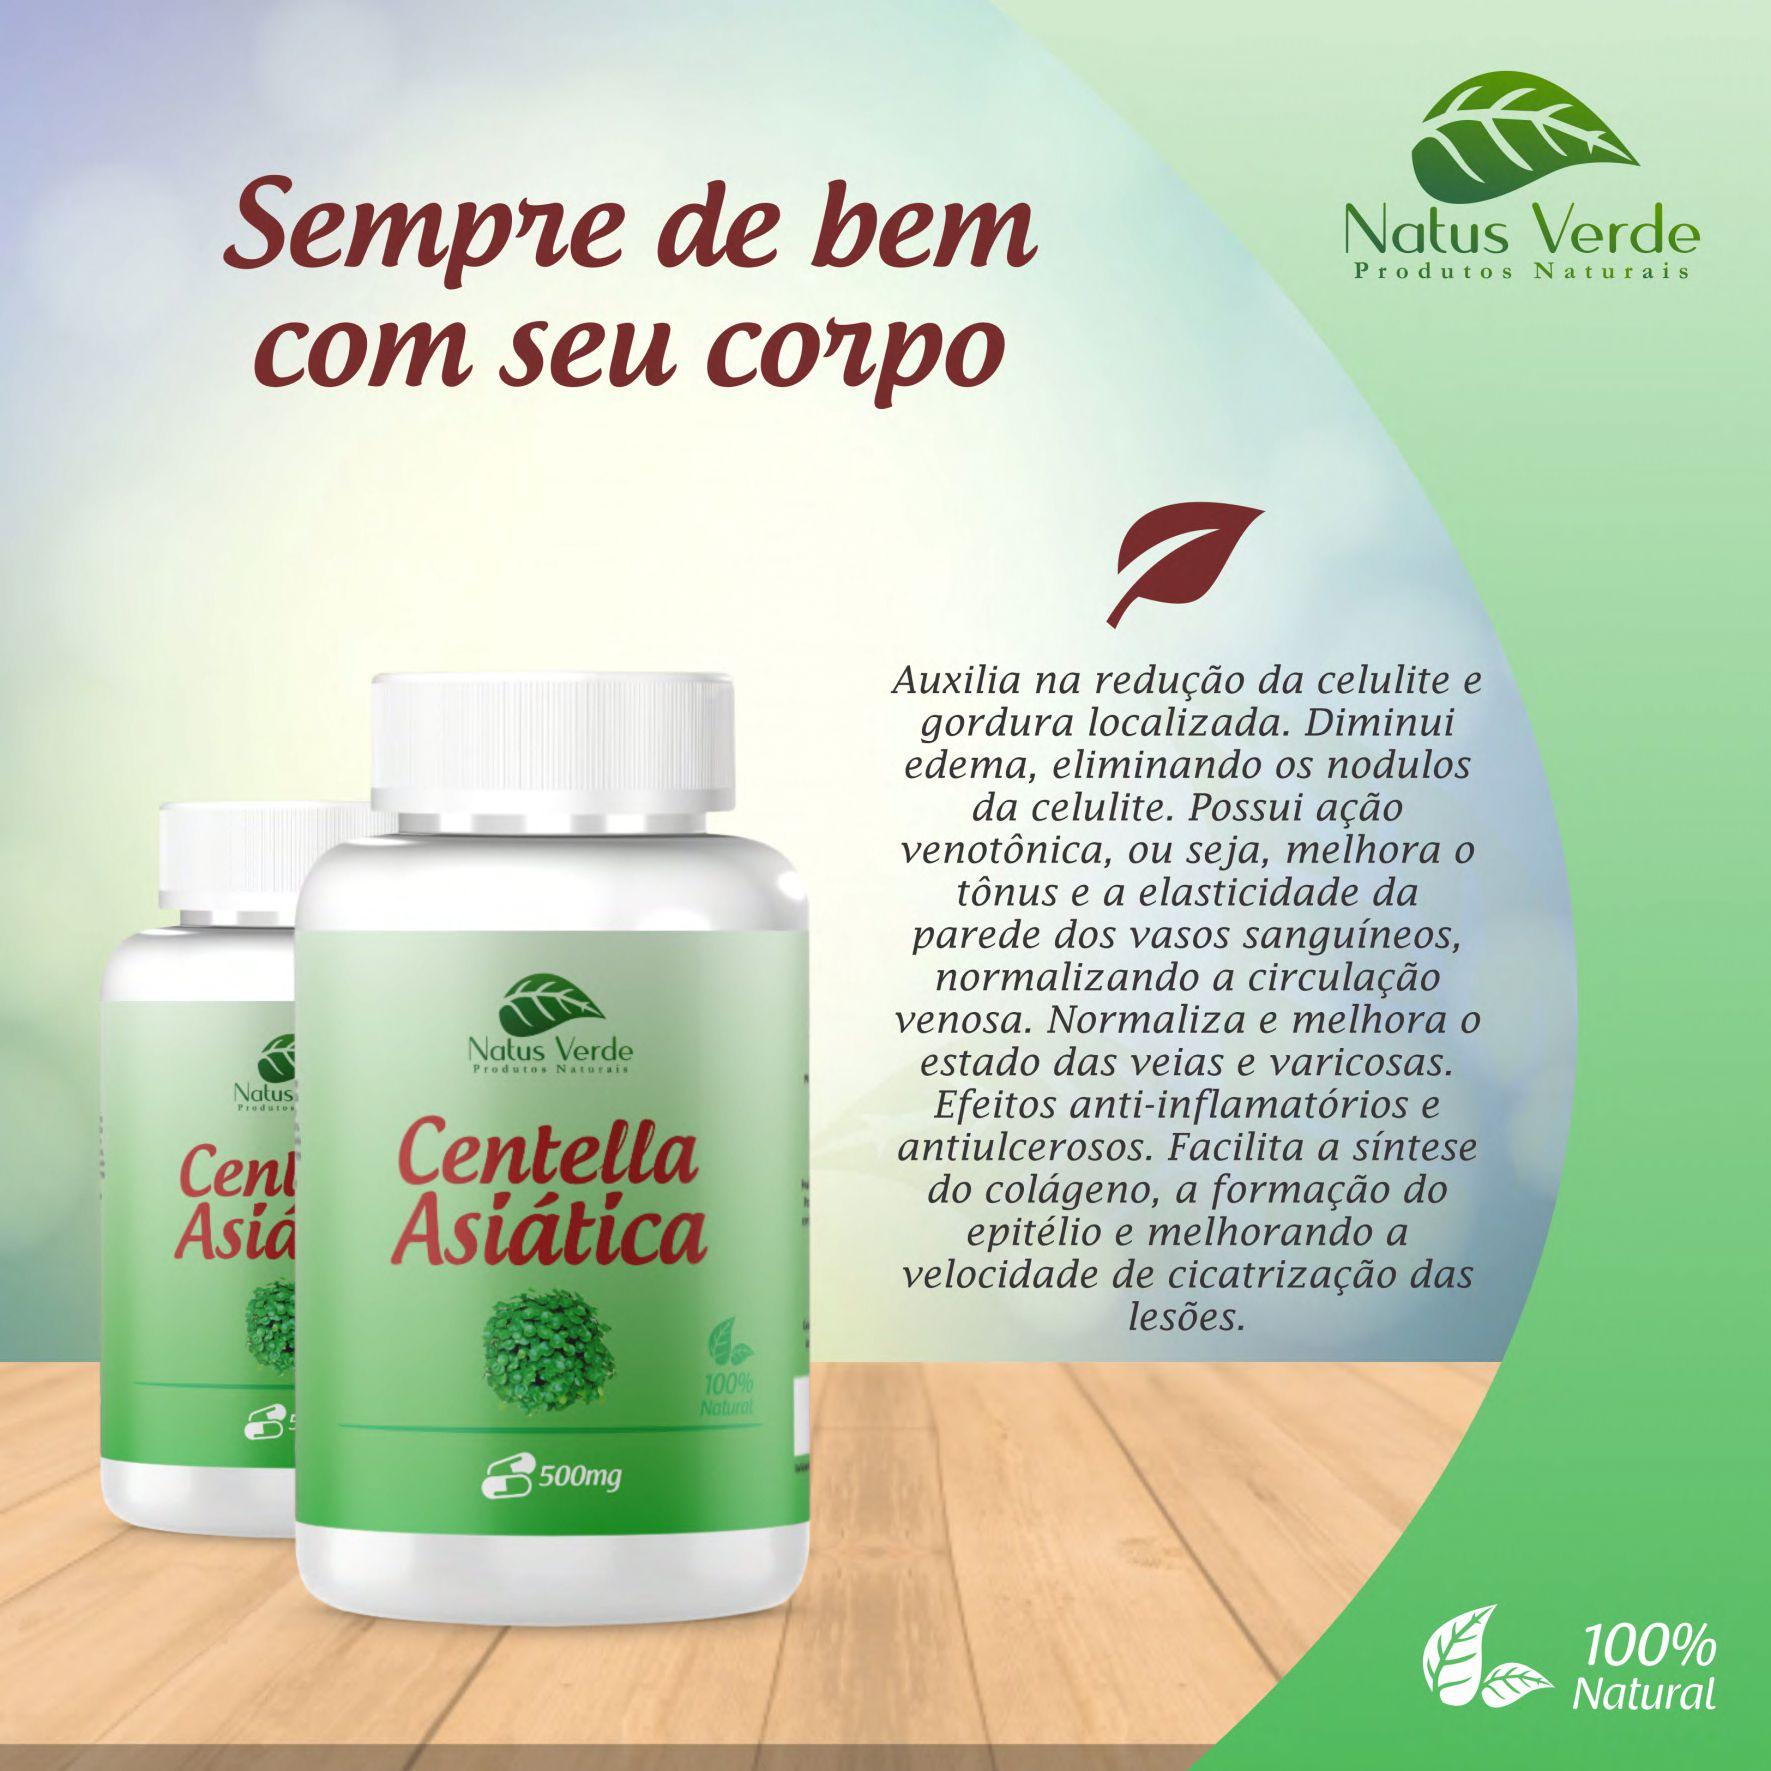 Composto natural Centella Asiática Produto Natural Natus Verde  - Fribasex - Fabricasex.com